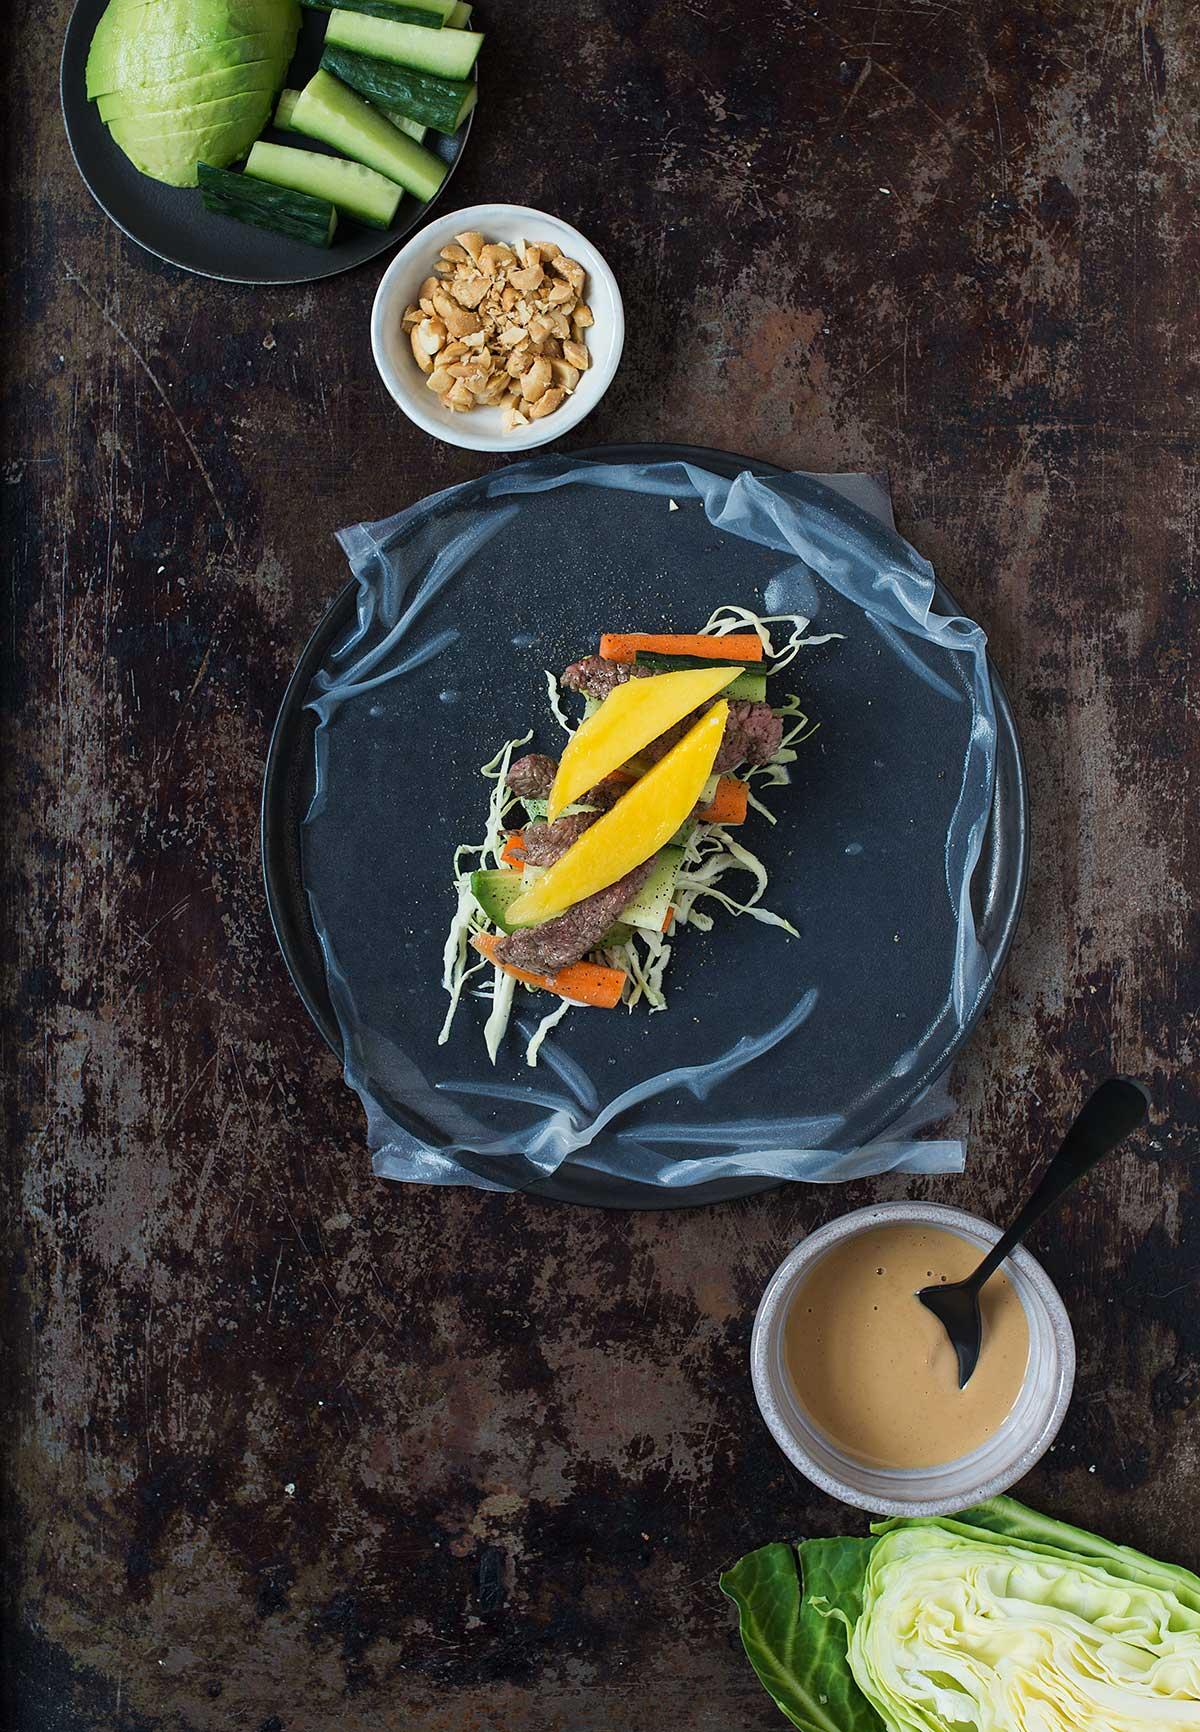 Vietnamesiske forårsruller med oksekød og peanutbutter-dressing | Frk. Kræsen